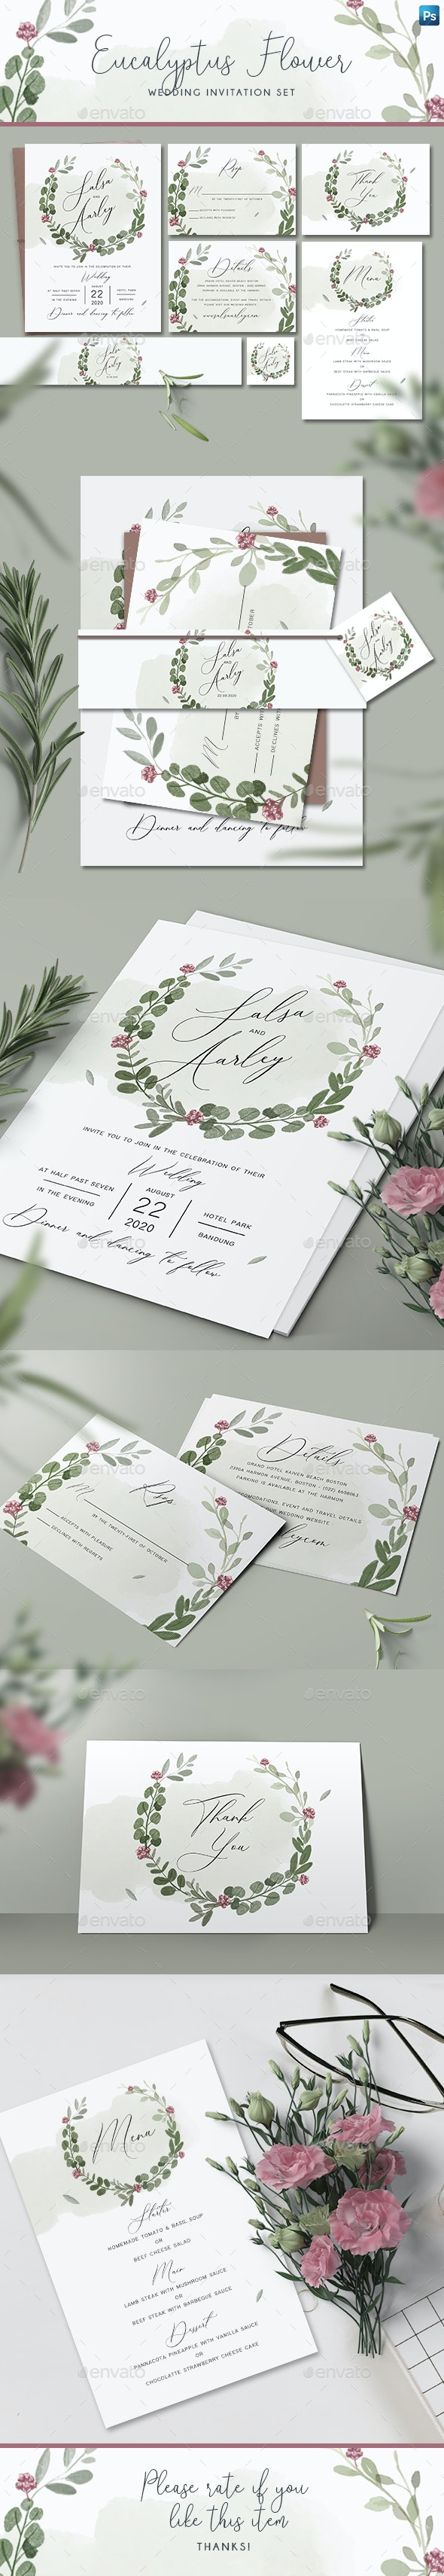 Eucalyptus Flower Wedding Invitation Set - Weddings Cards & Invites